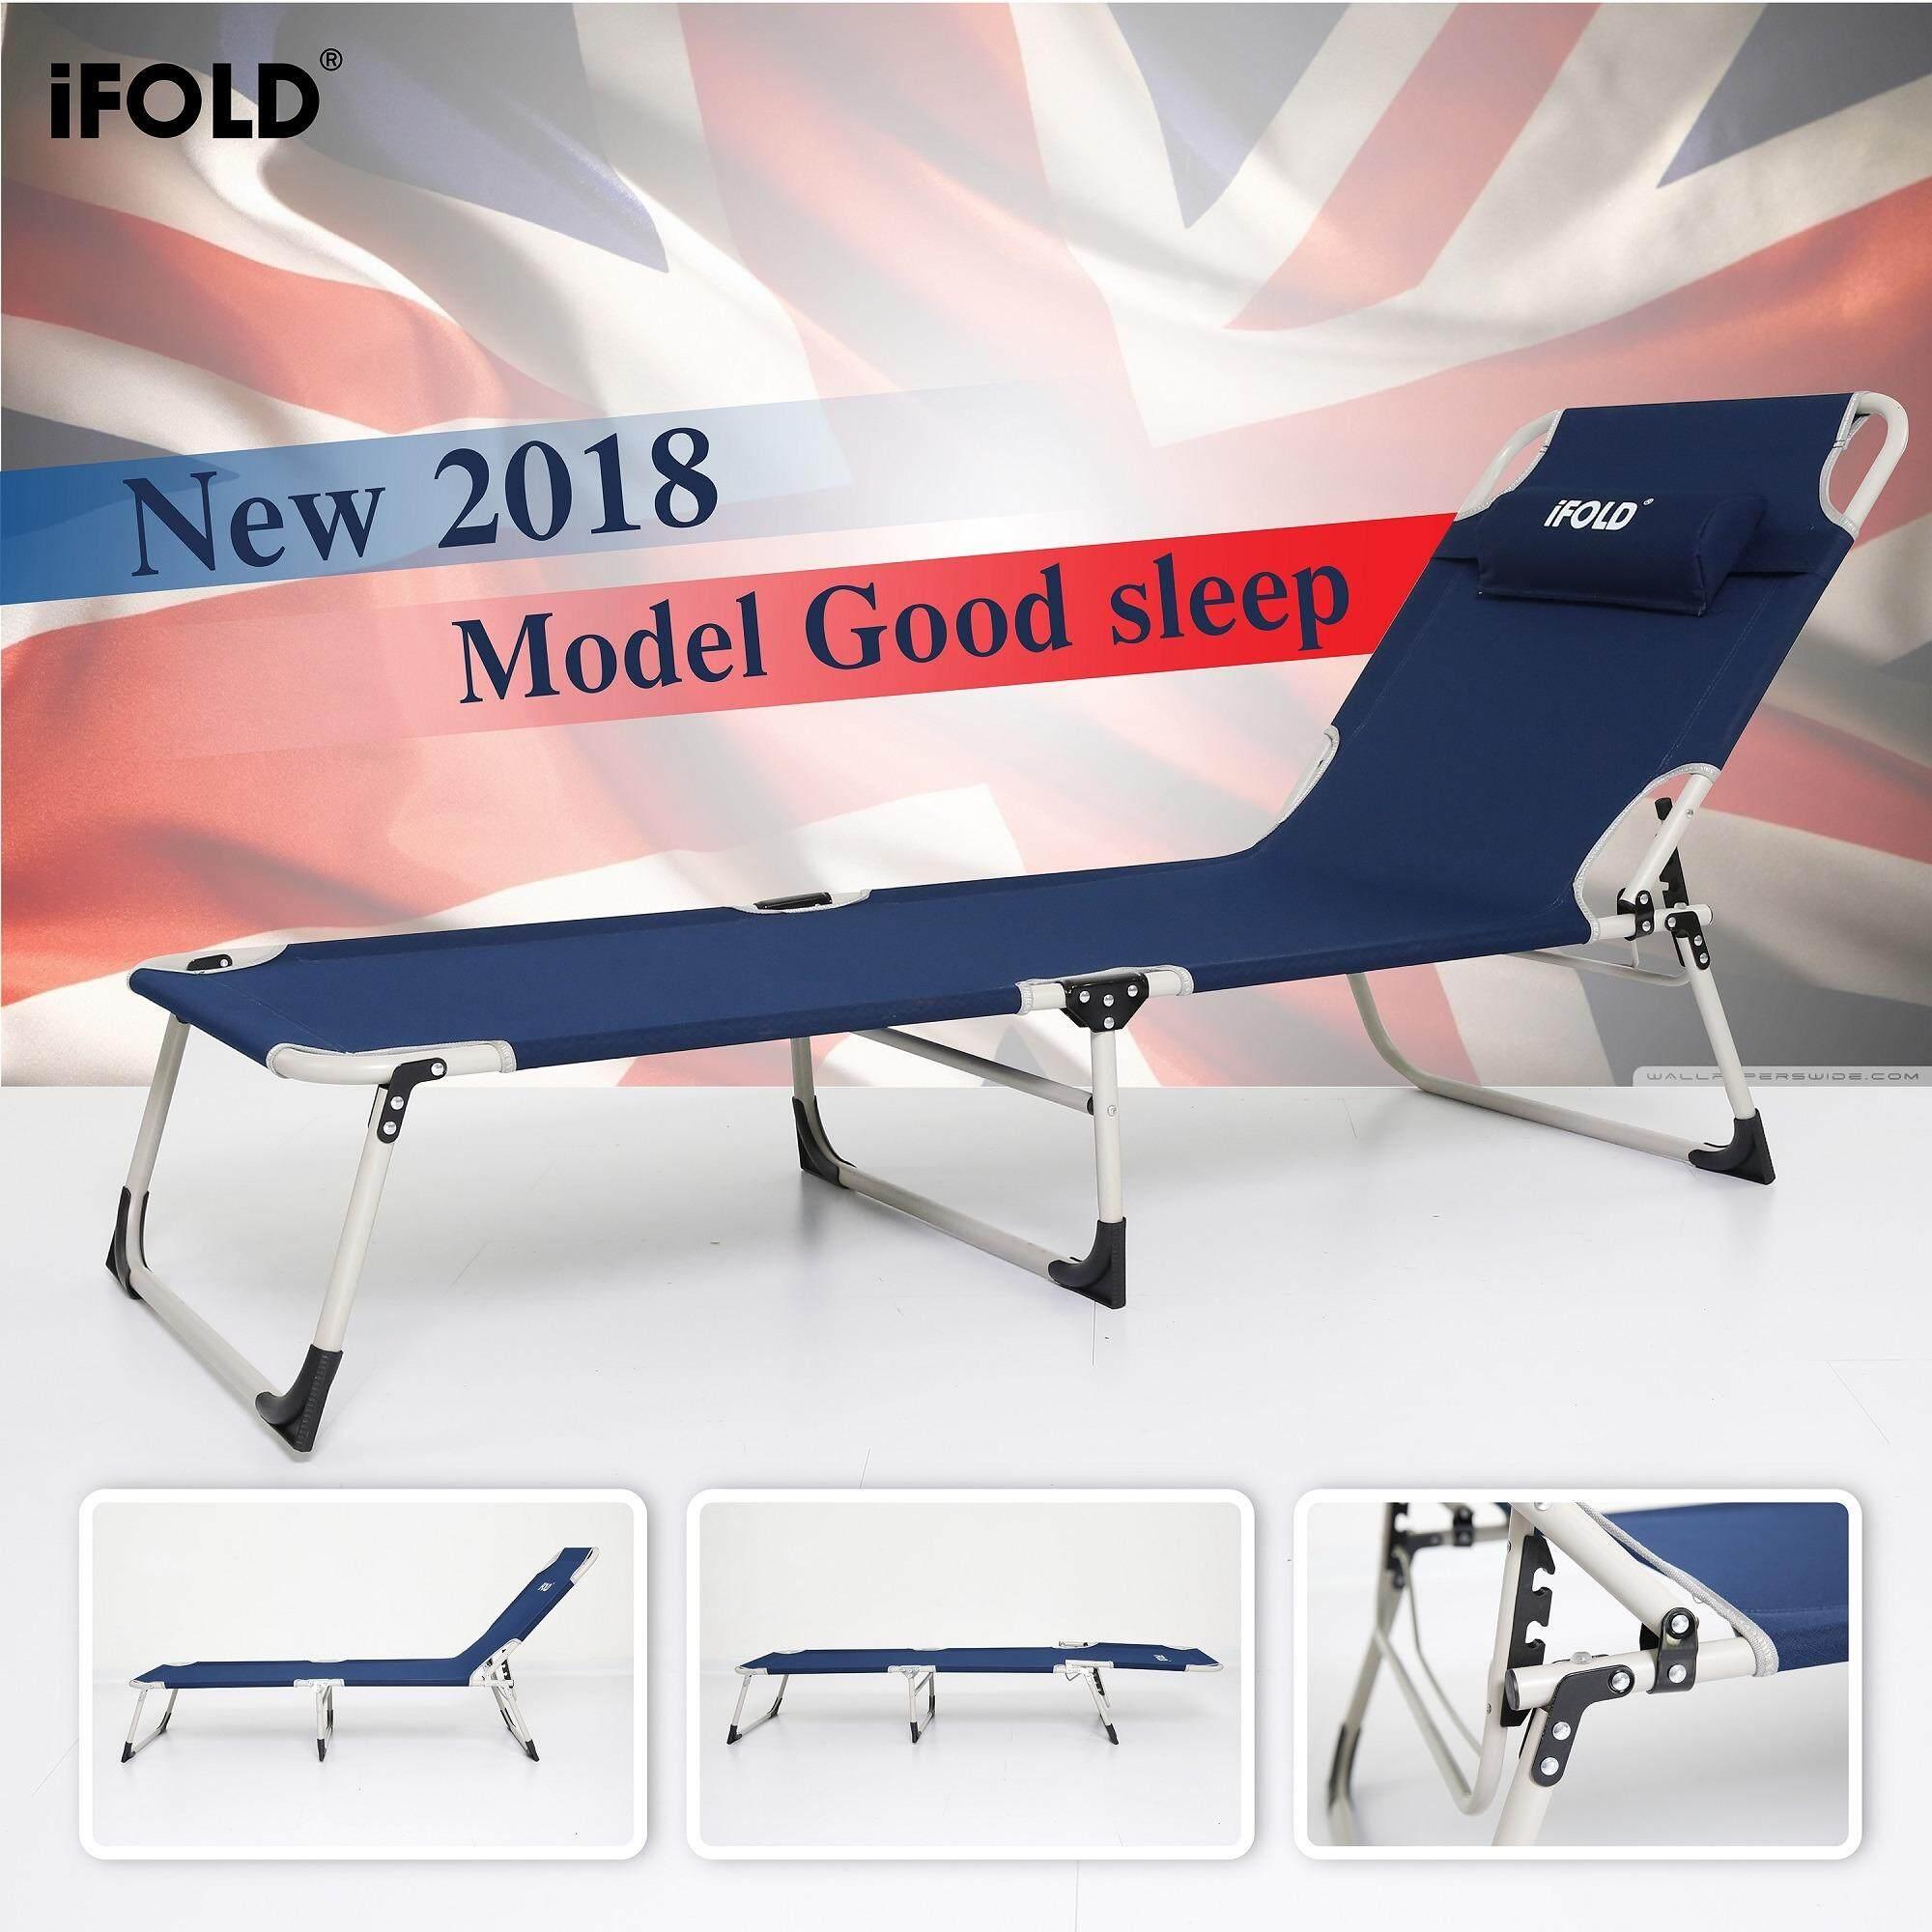 Ifold 3 Legs Blue เตียงสนามแบบพับได้ .